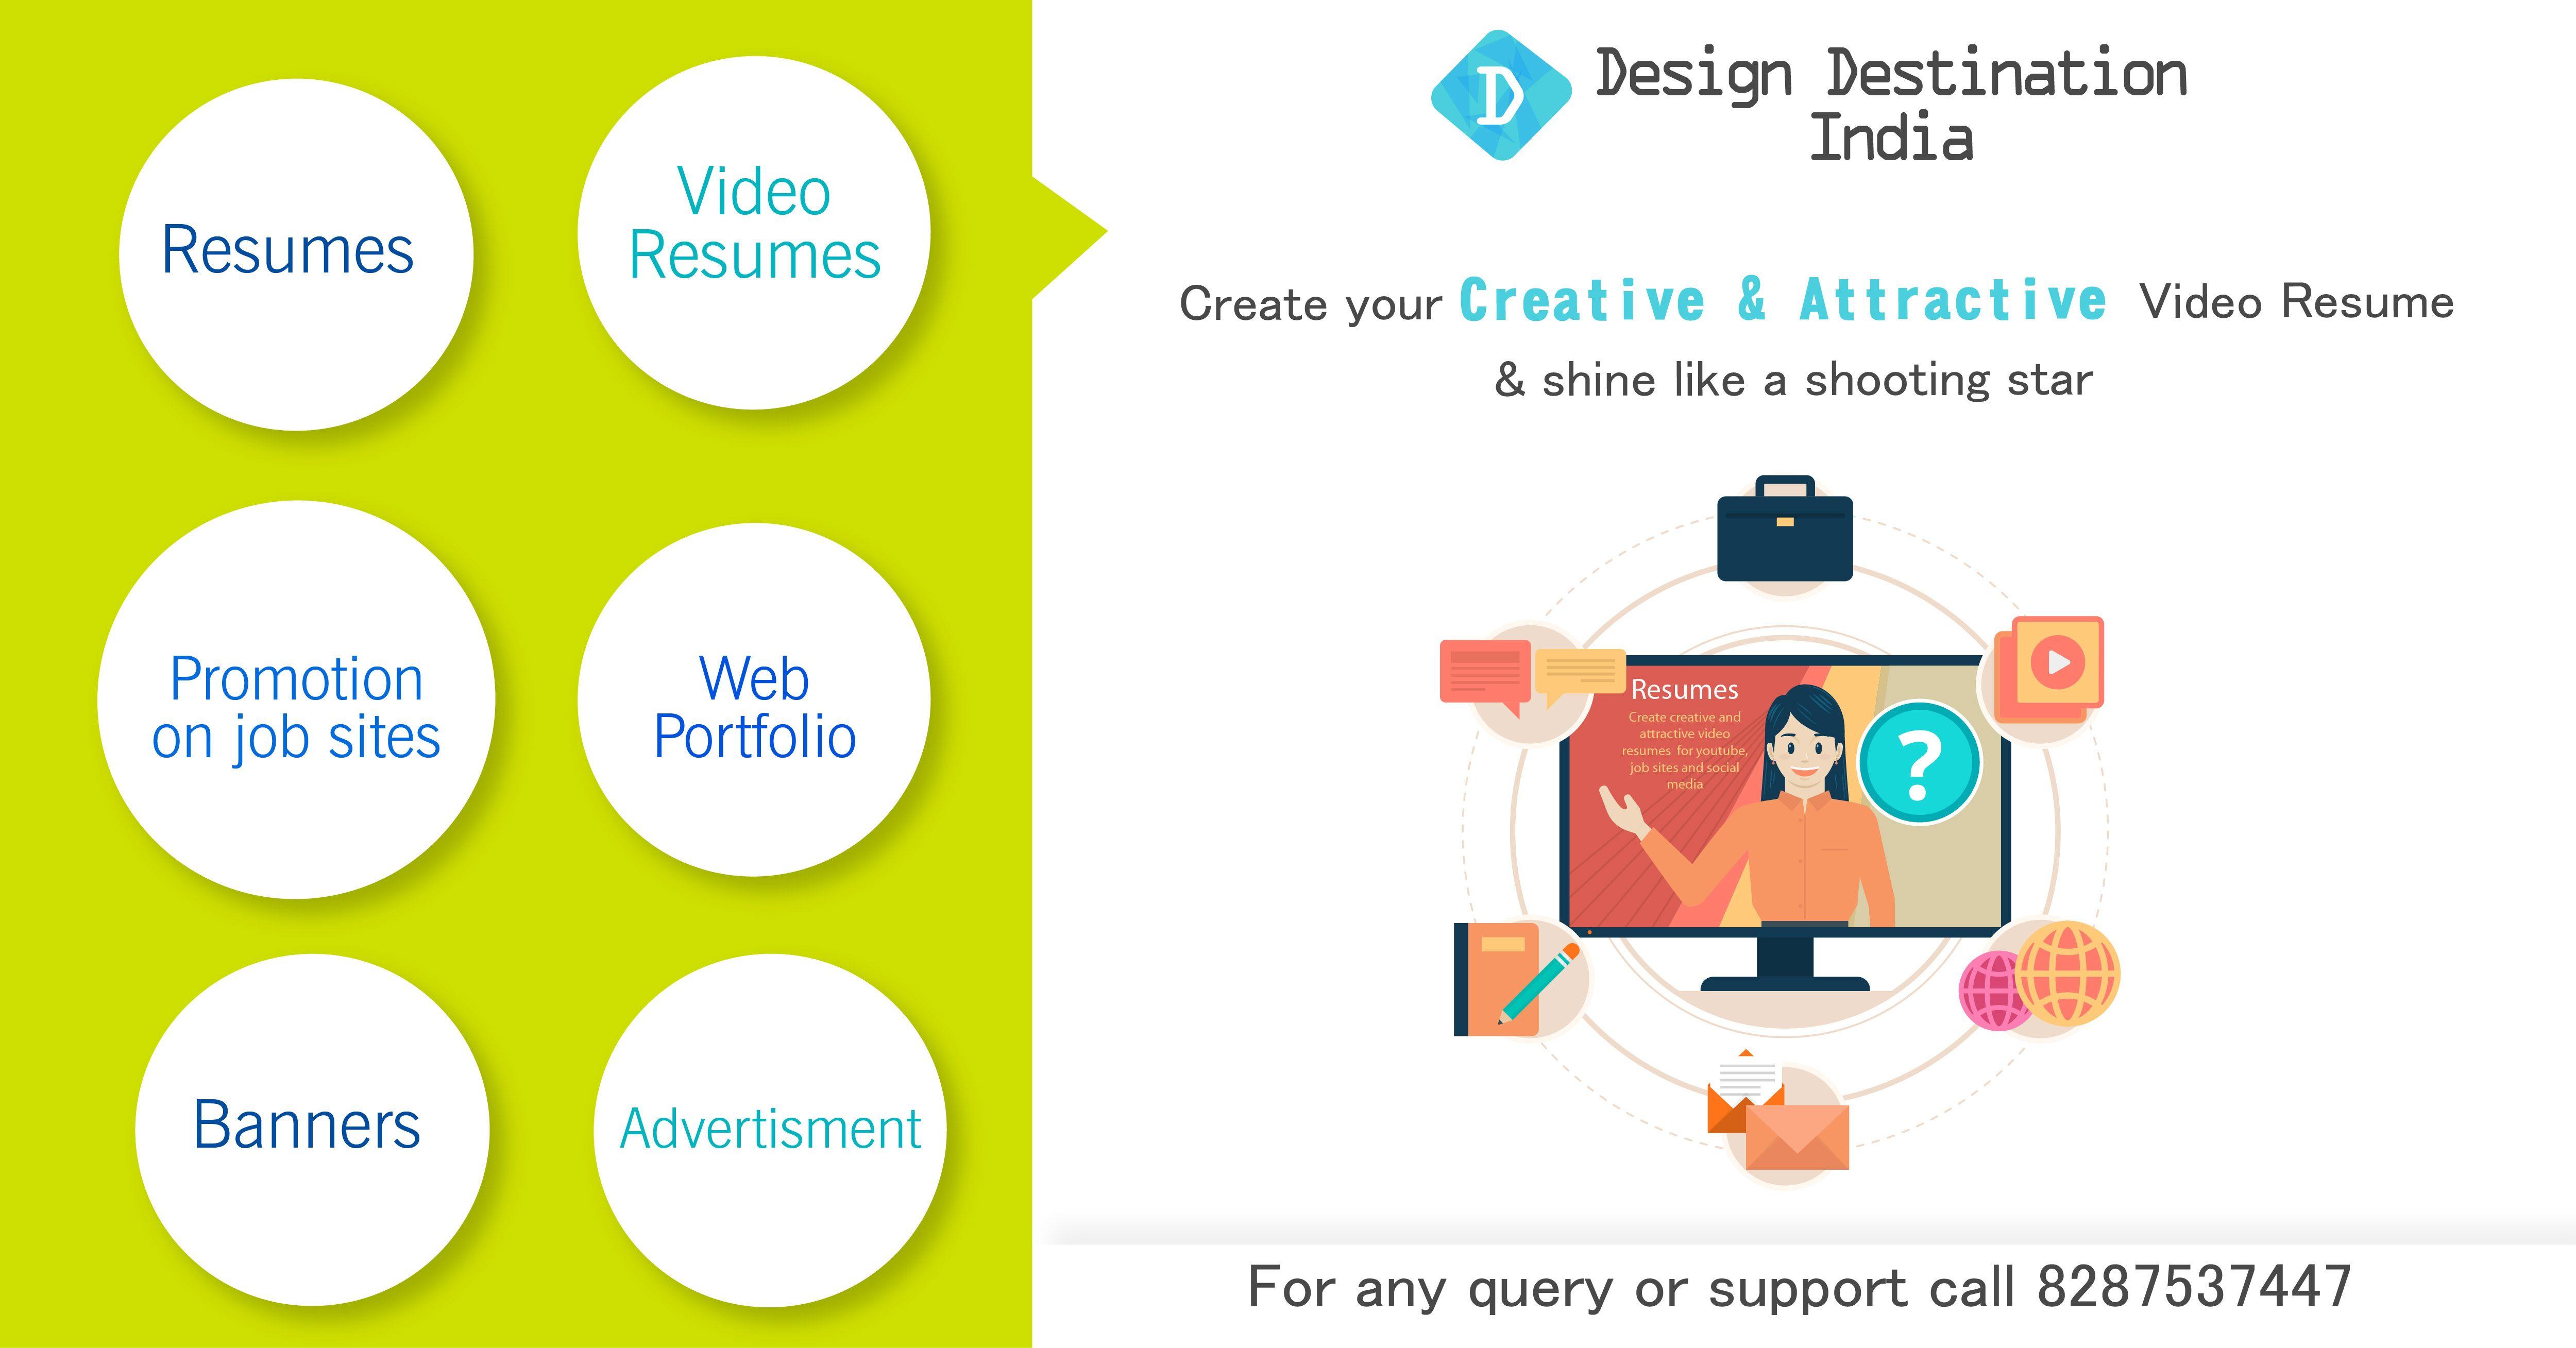 Design Destination India Create your video resume or web